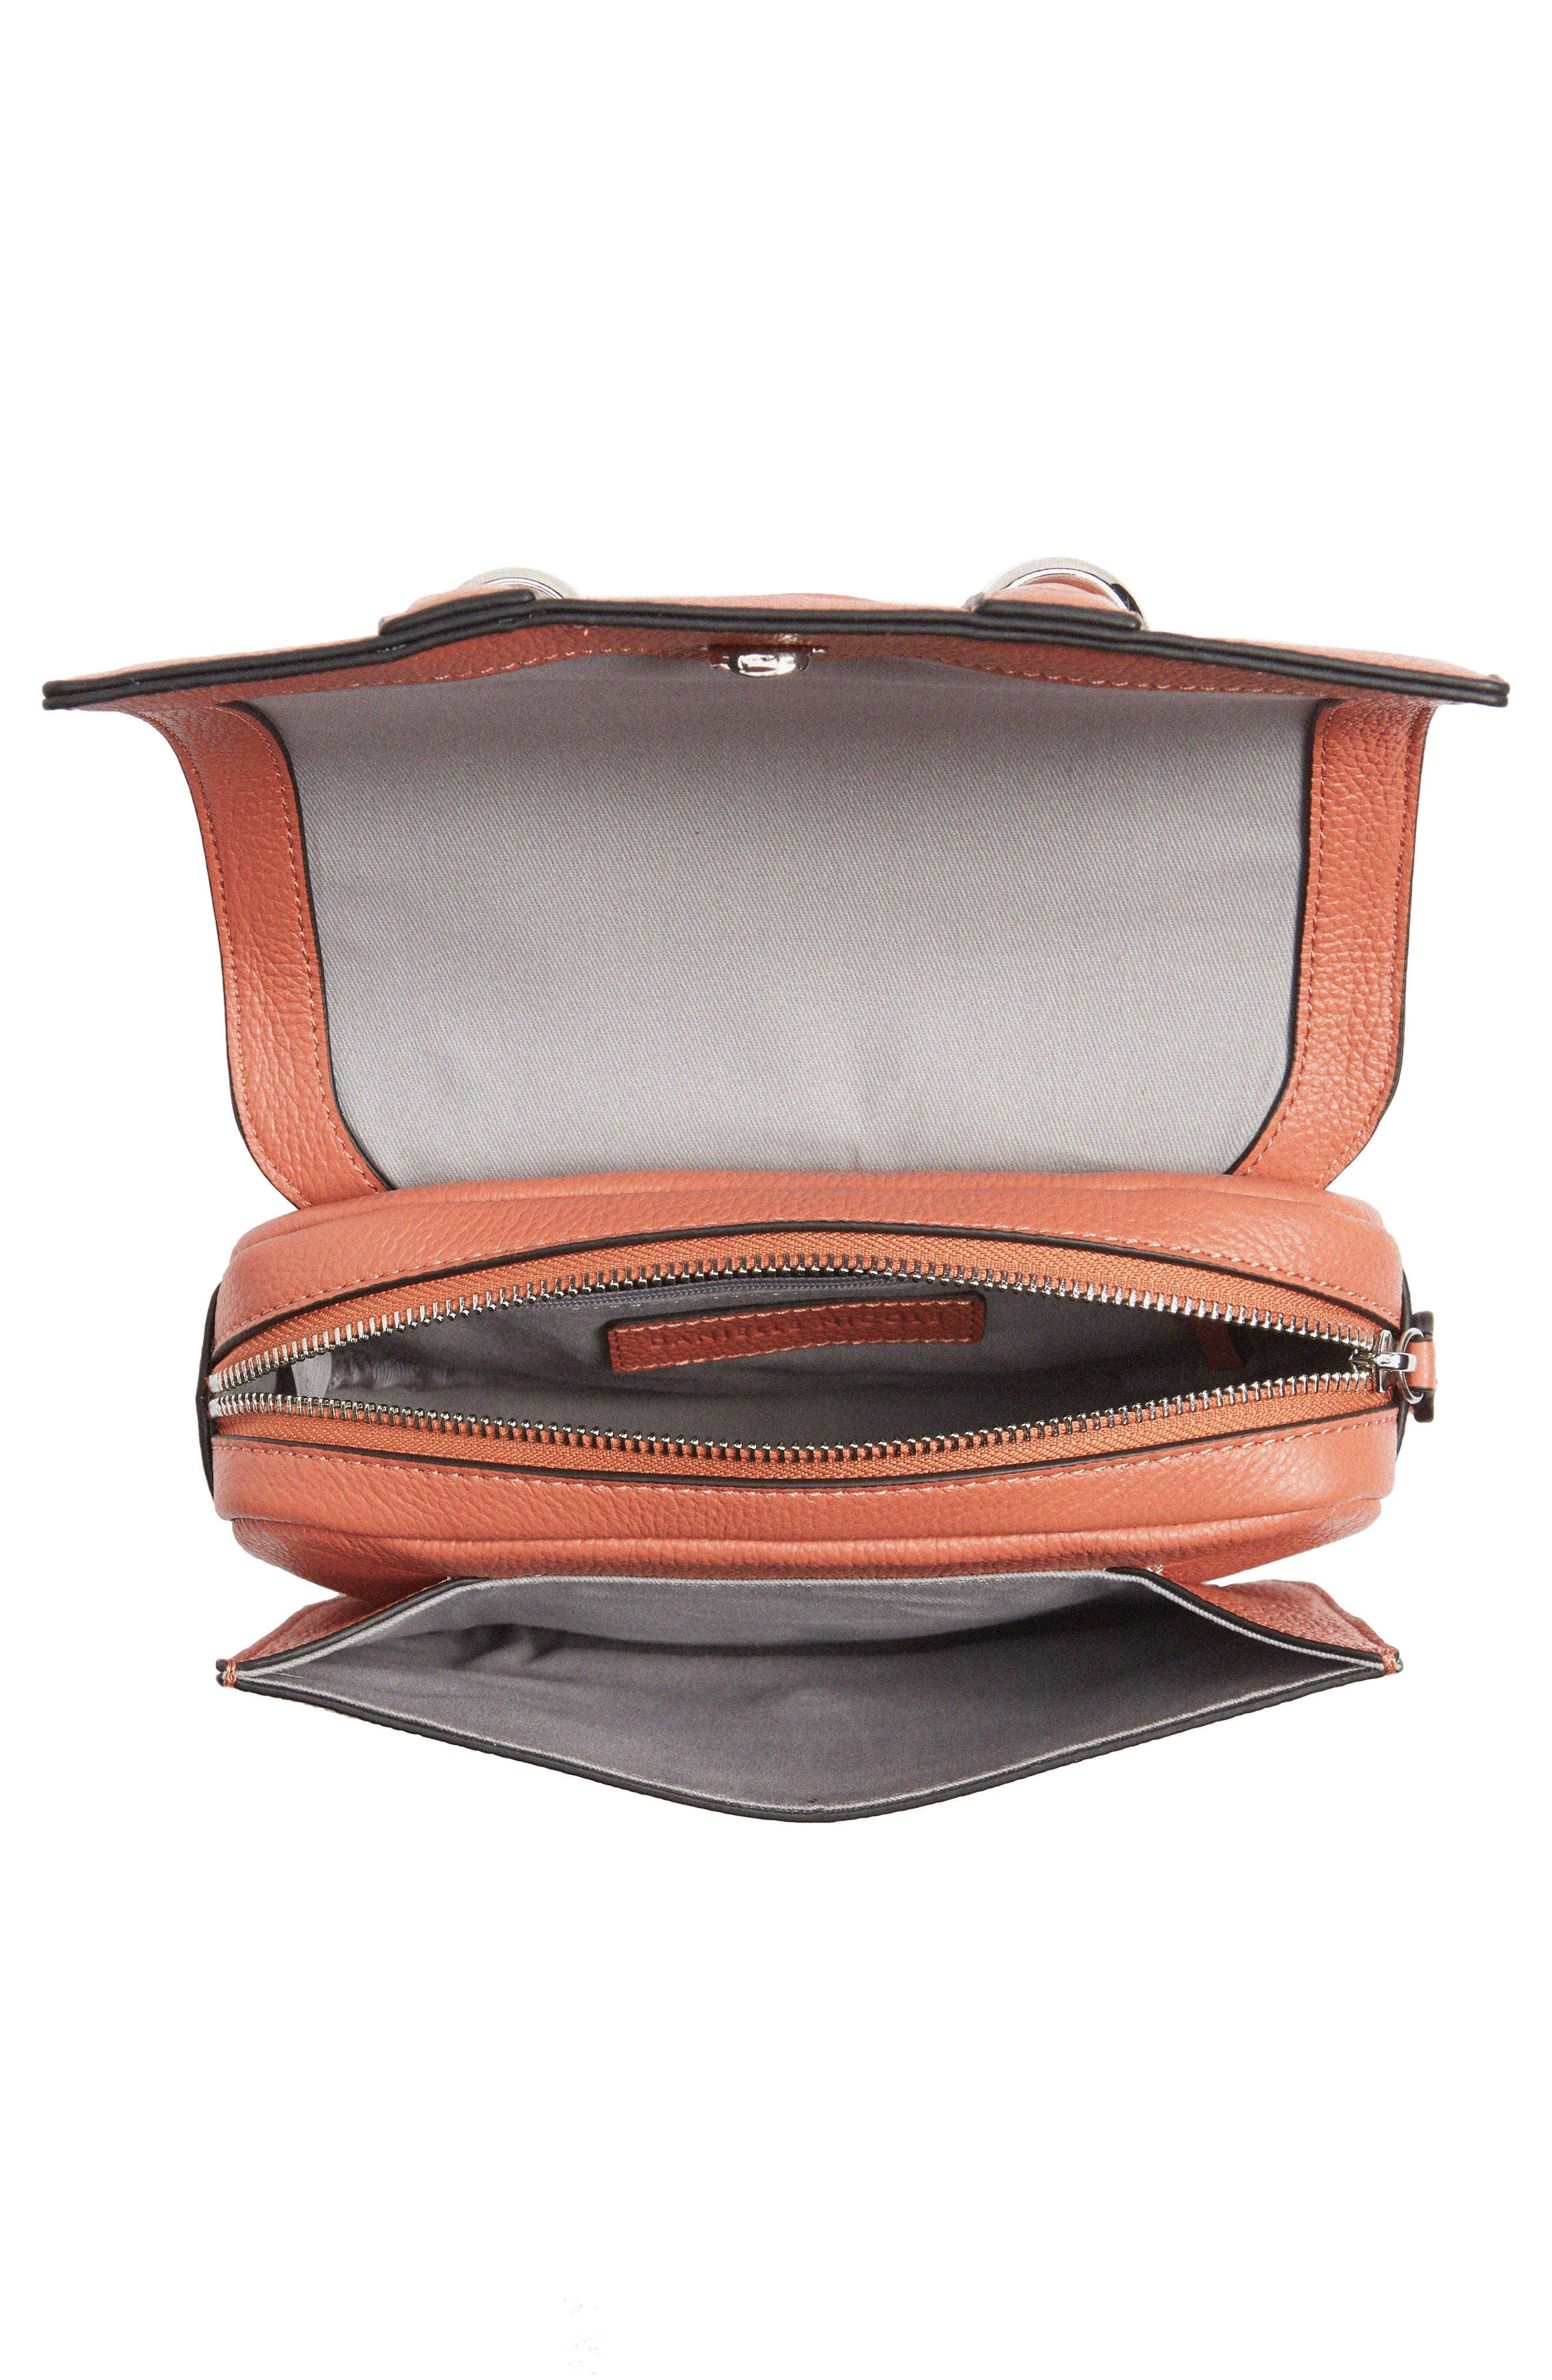 DANIELLE NICOLE,                             Kinsley Leather Crossbody Bag,                             Alternate thumbnail 4, color,                             600